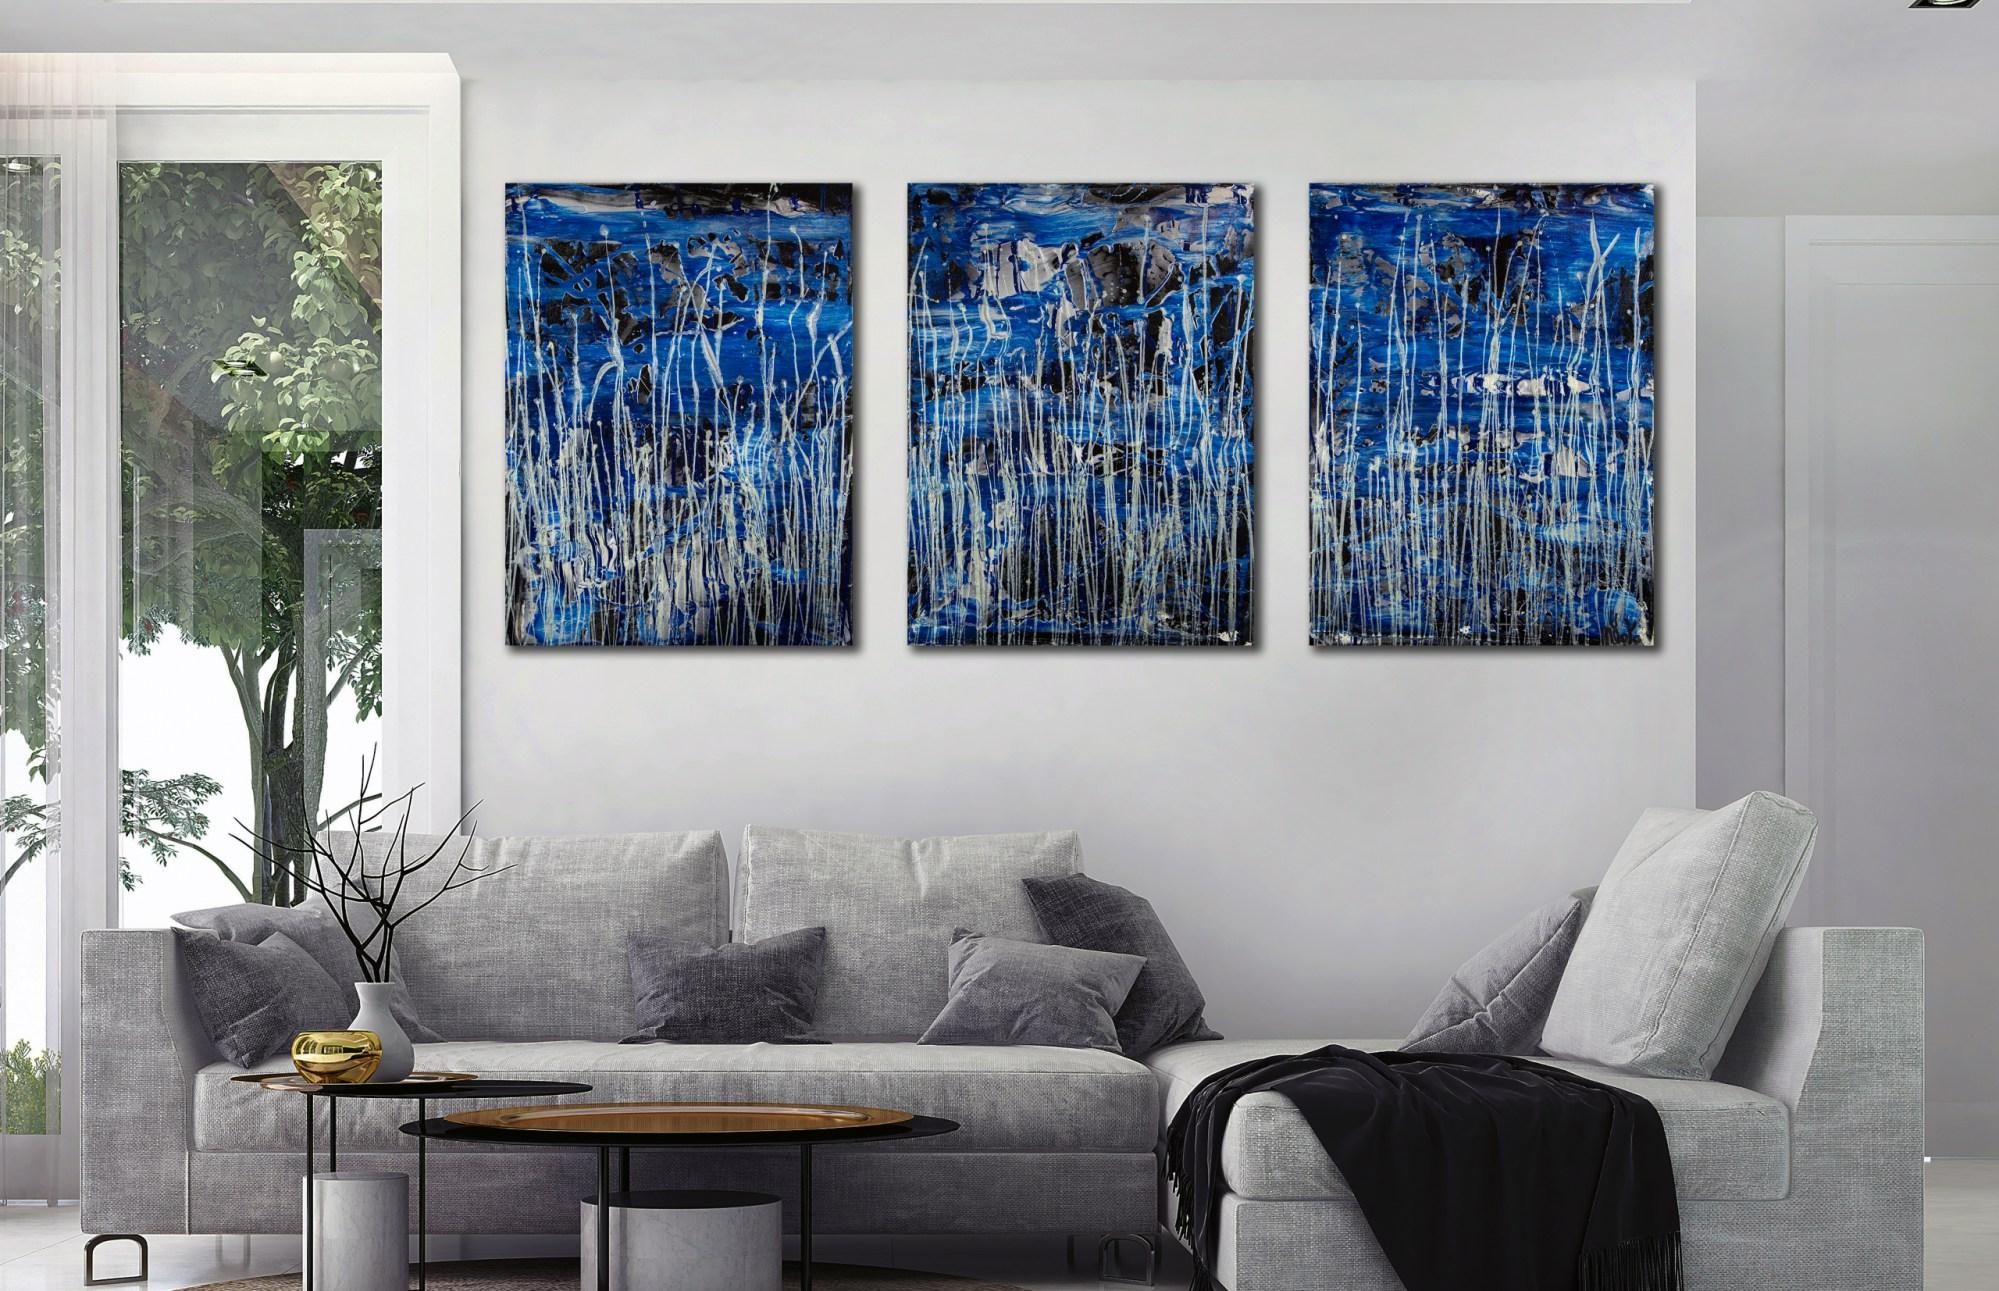 Supermoon (Silver drizzles) (2021) / Triptych / Nestor Toro